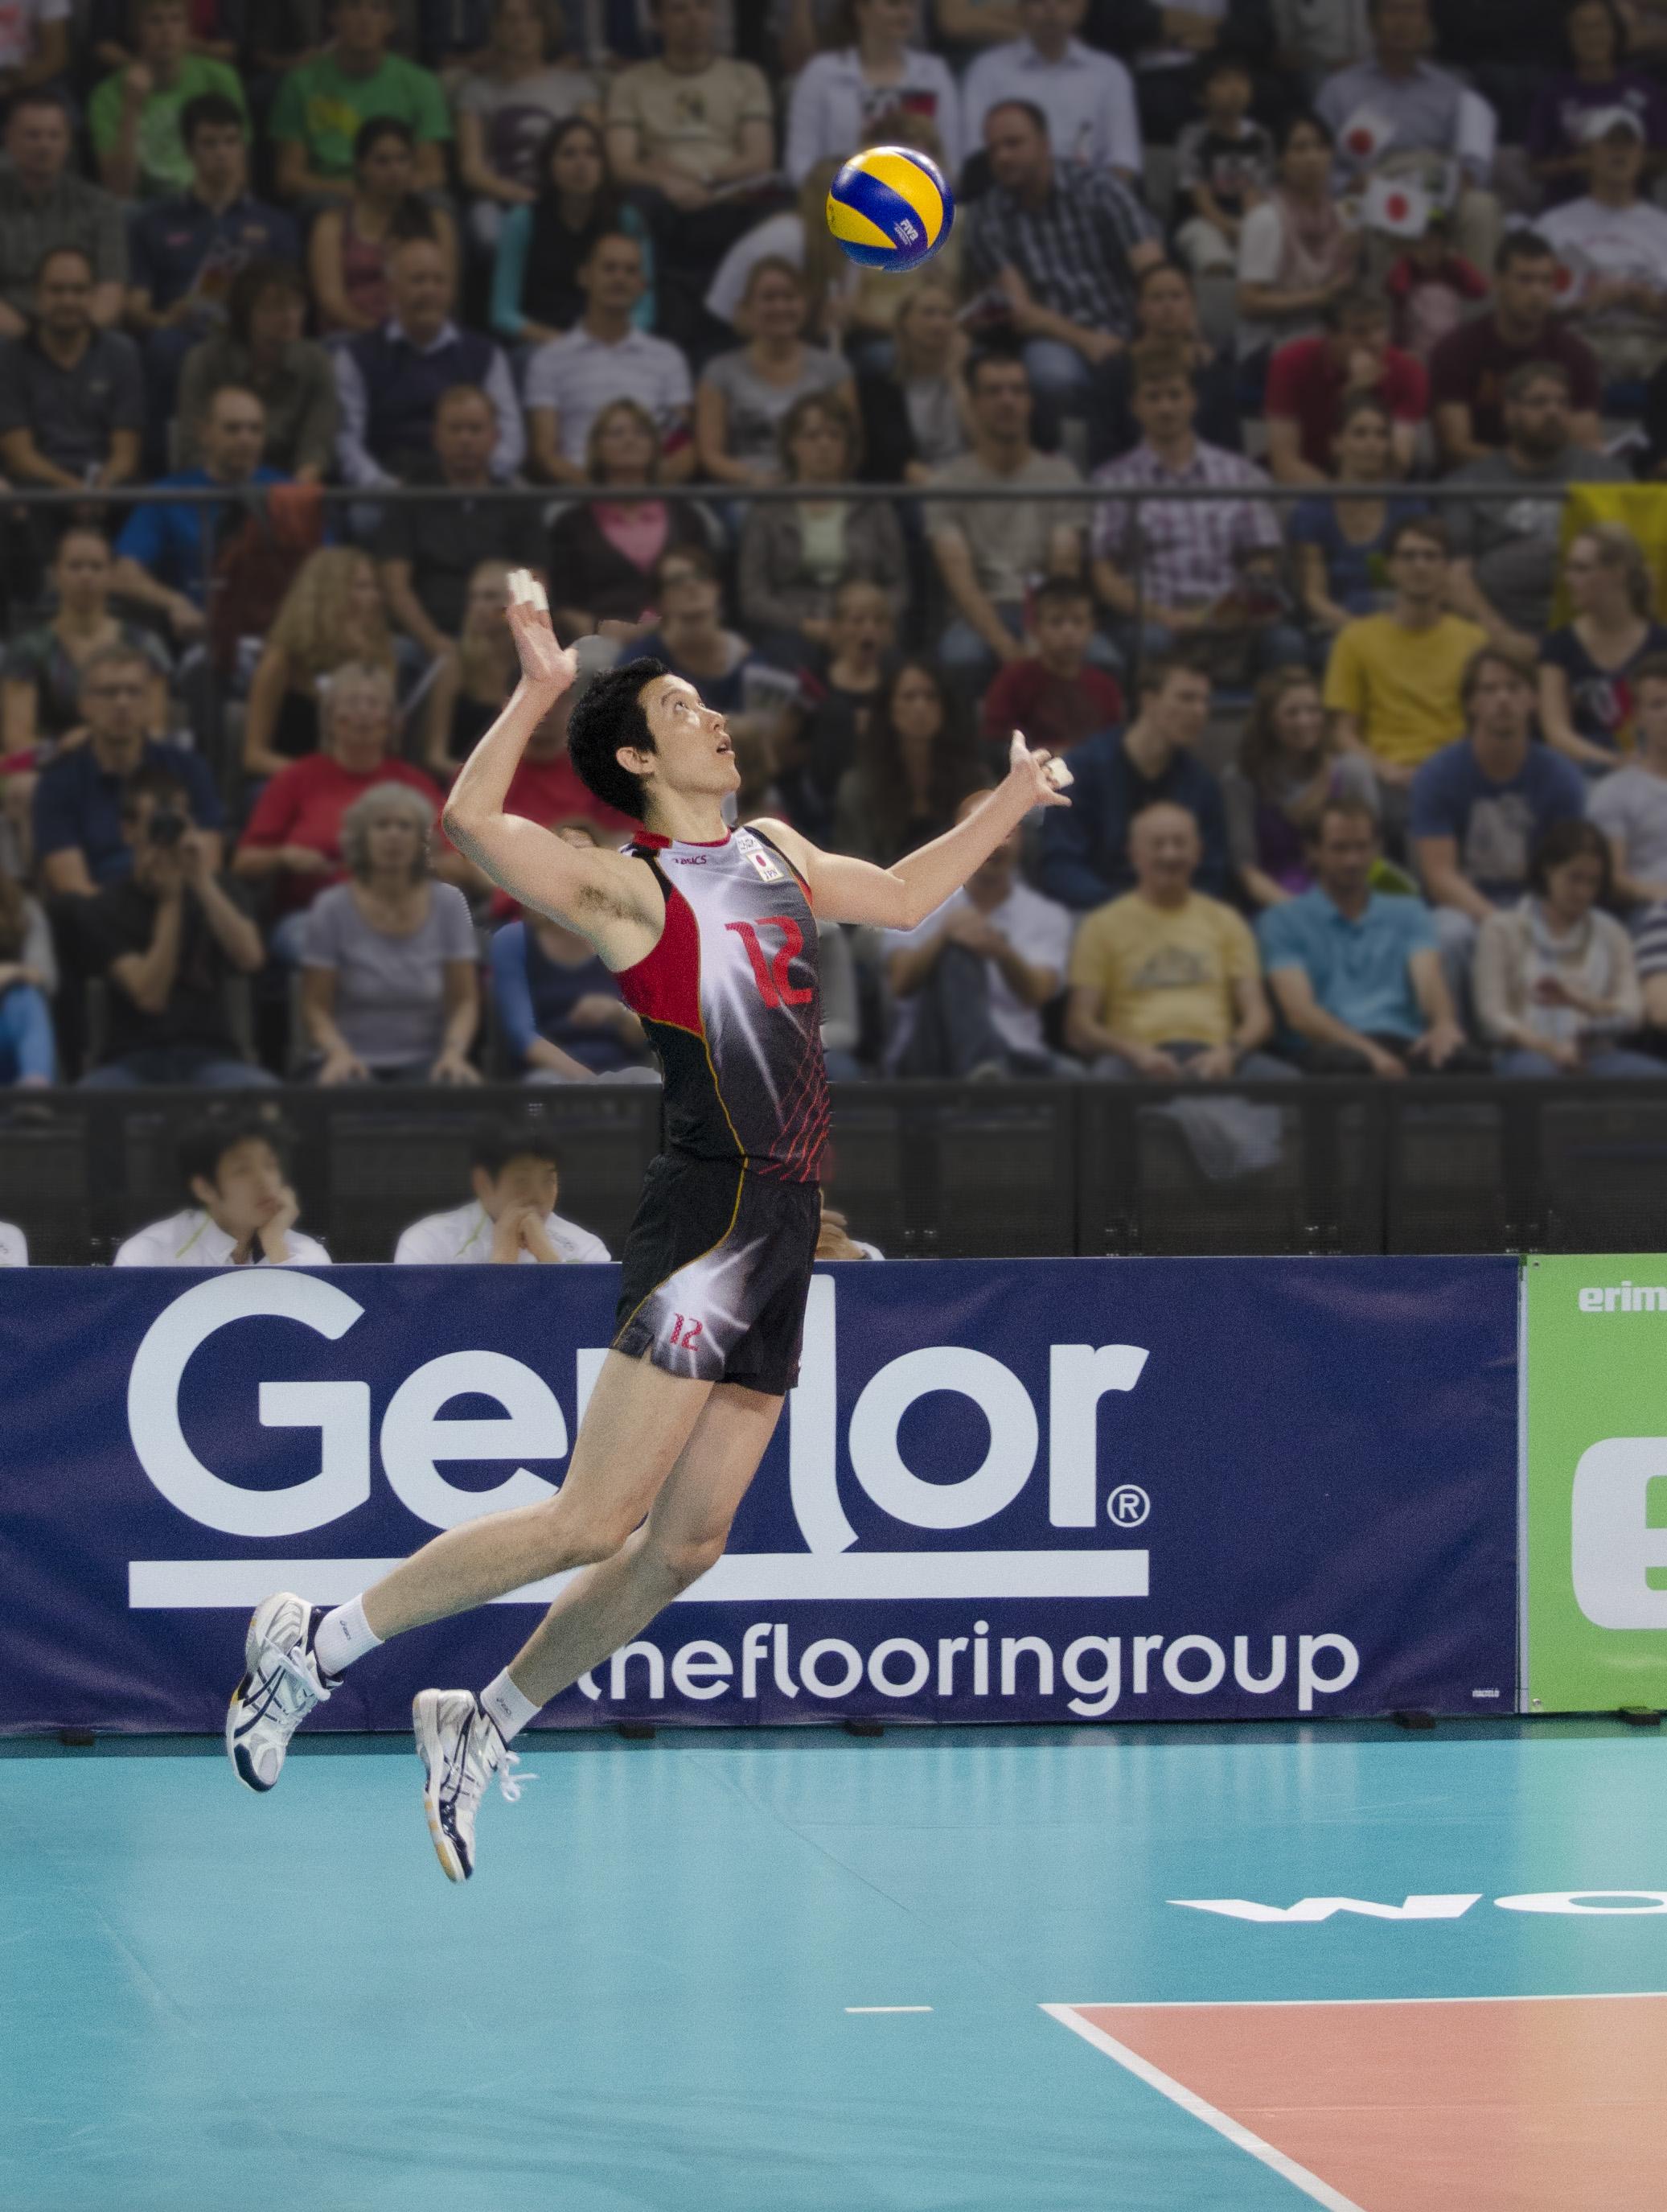 File:Volleyball Sprungaufschlag.jpg - Wikimedia Commons